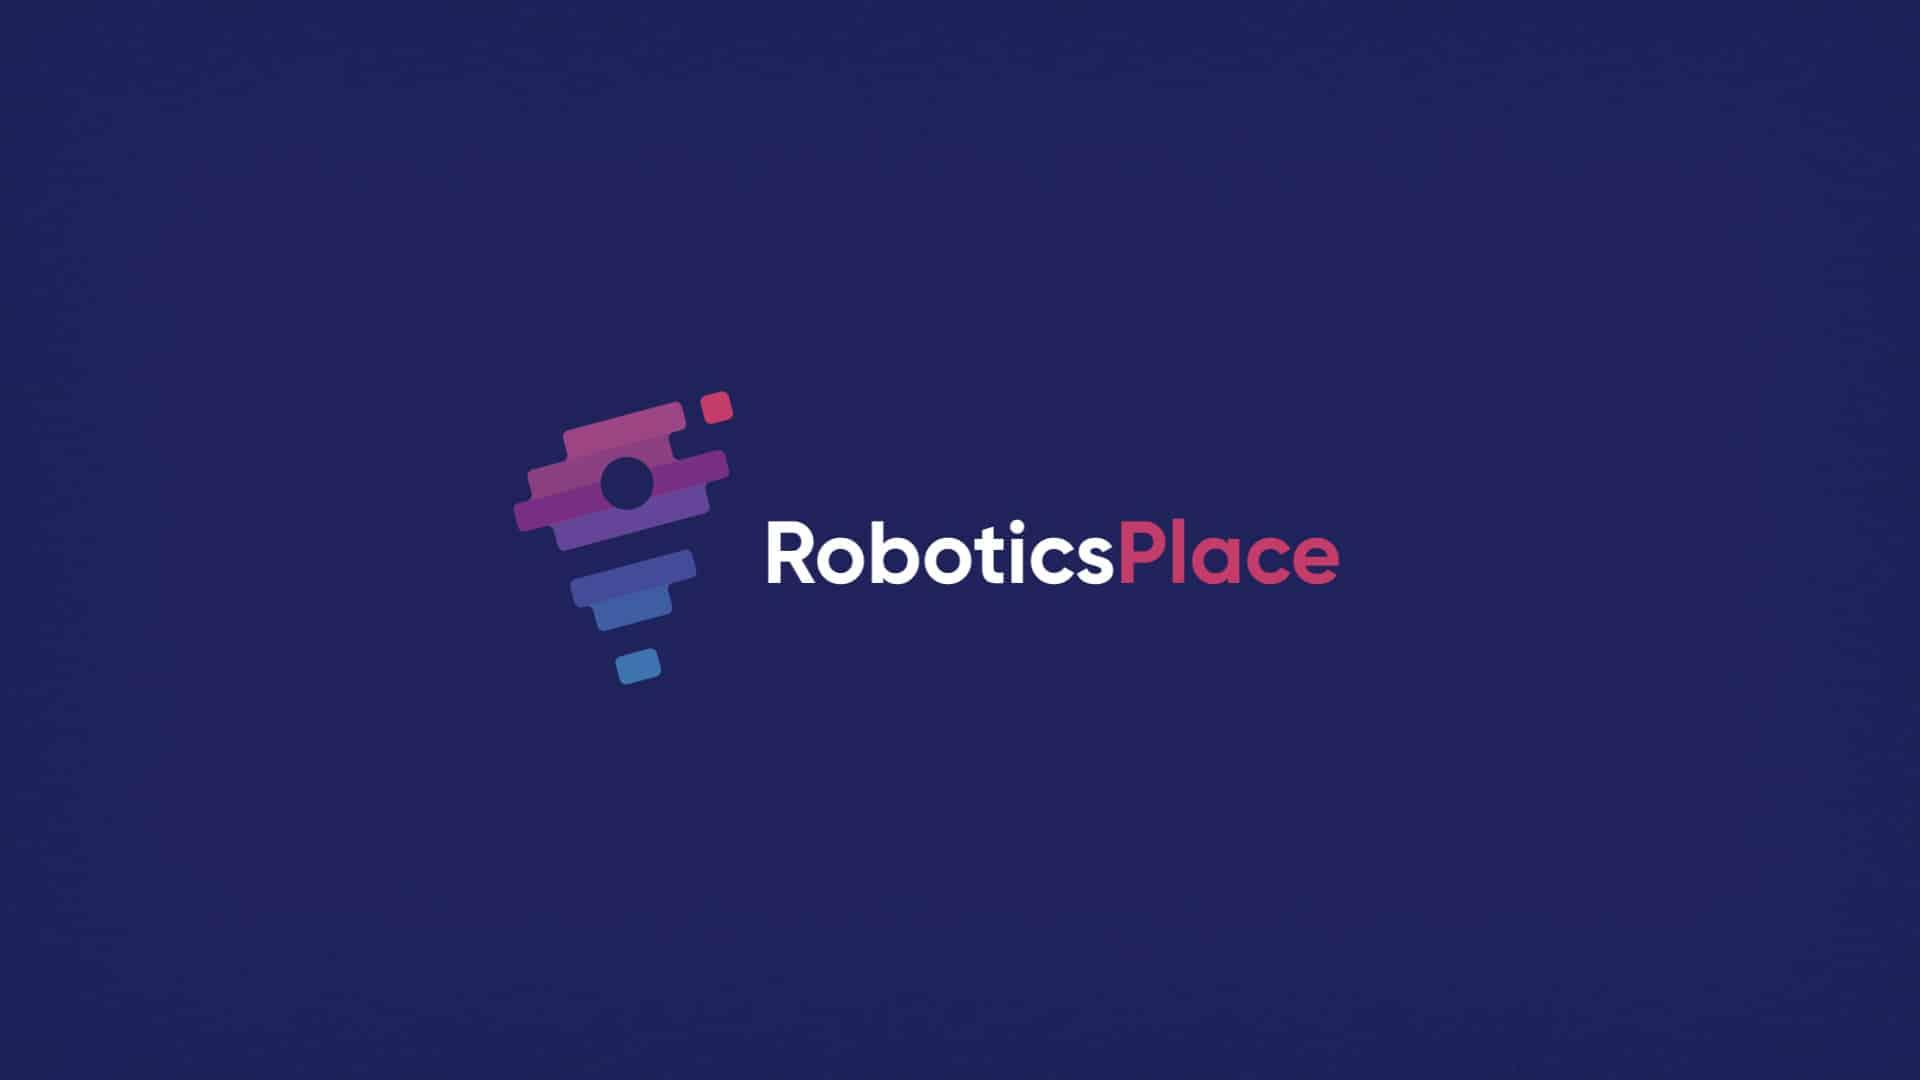 logo occitanie robotics place